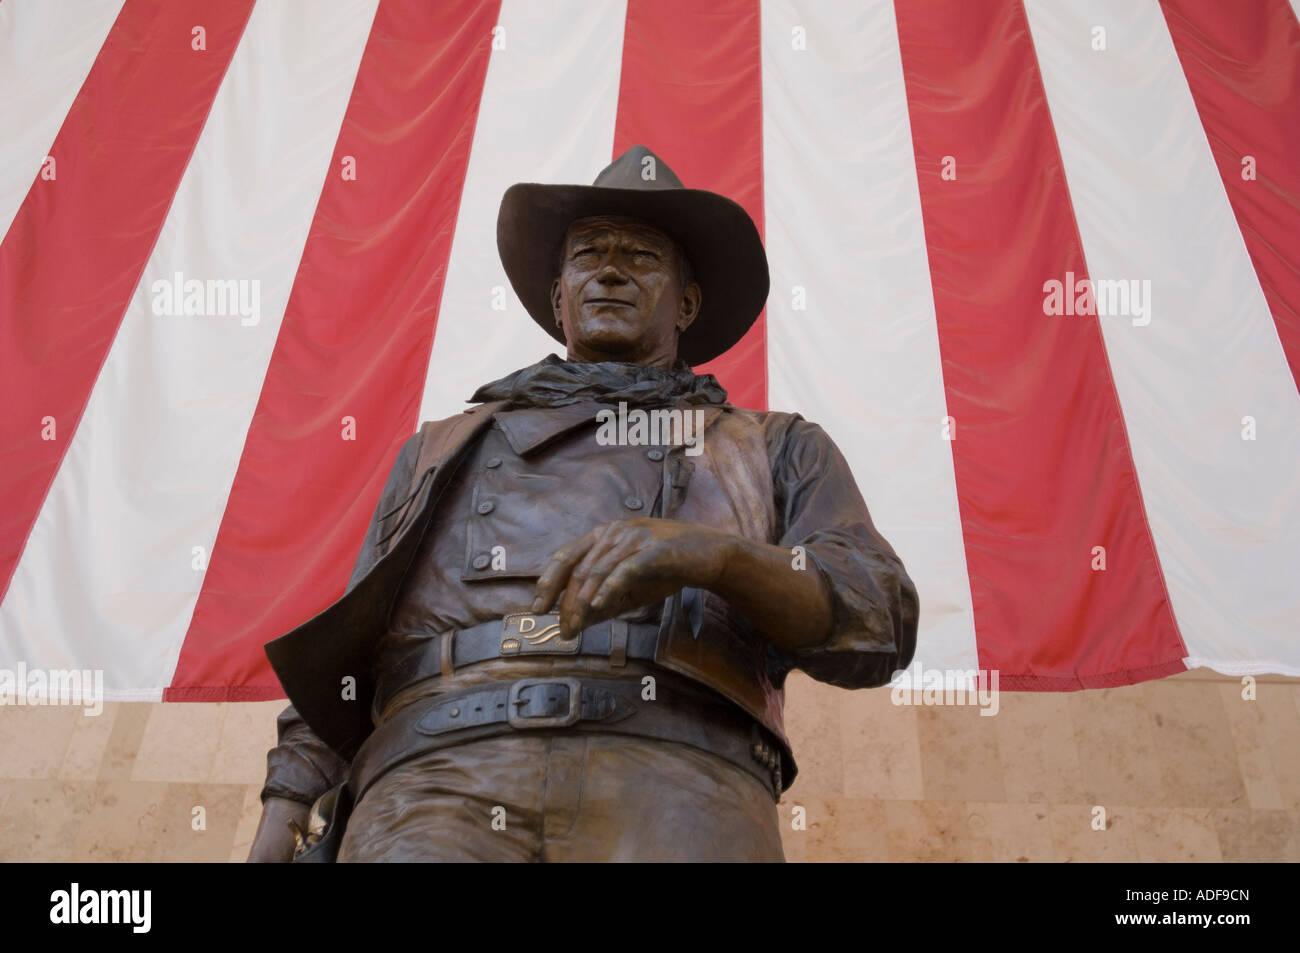 Giant stature of John Wayne welcomes passengers to the Orange County John Wayne Airport in Southern California - Stock Image